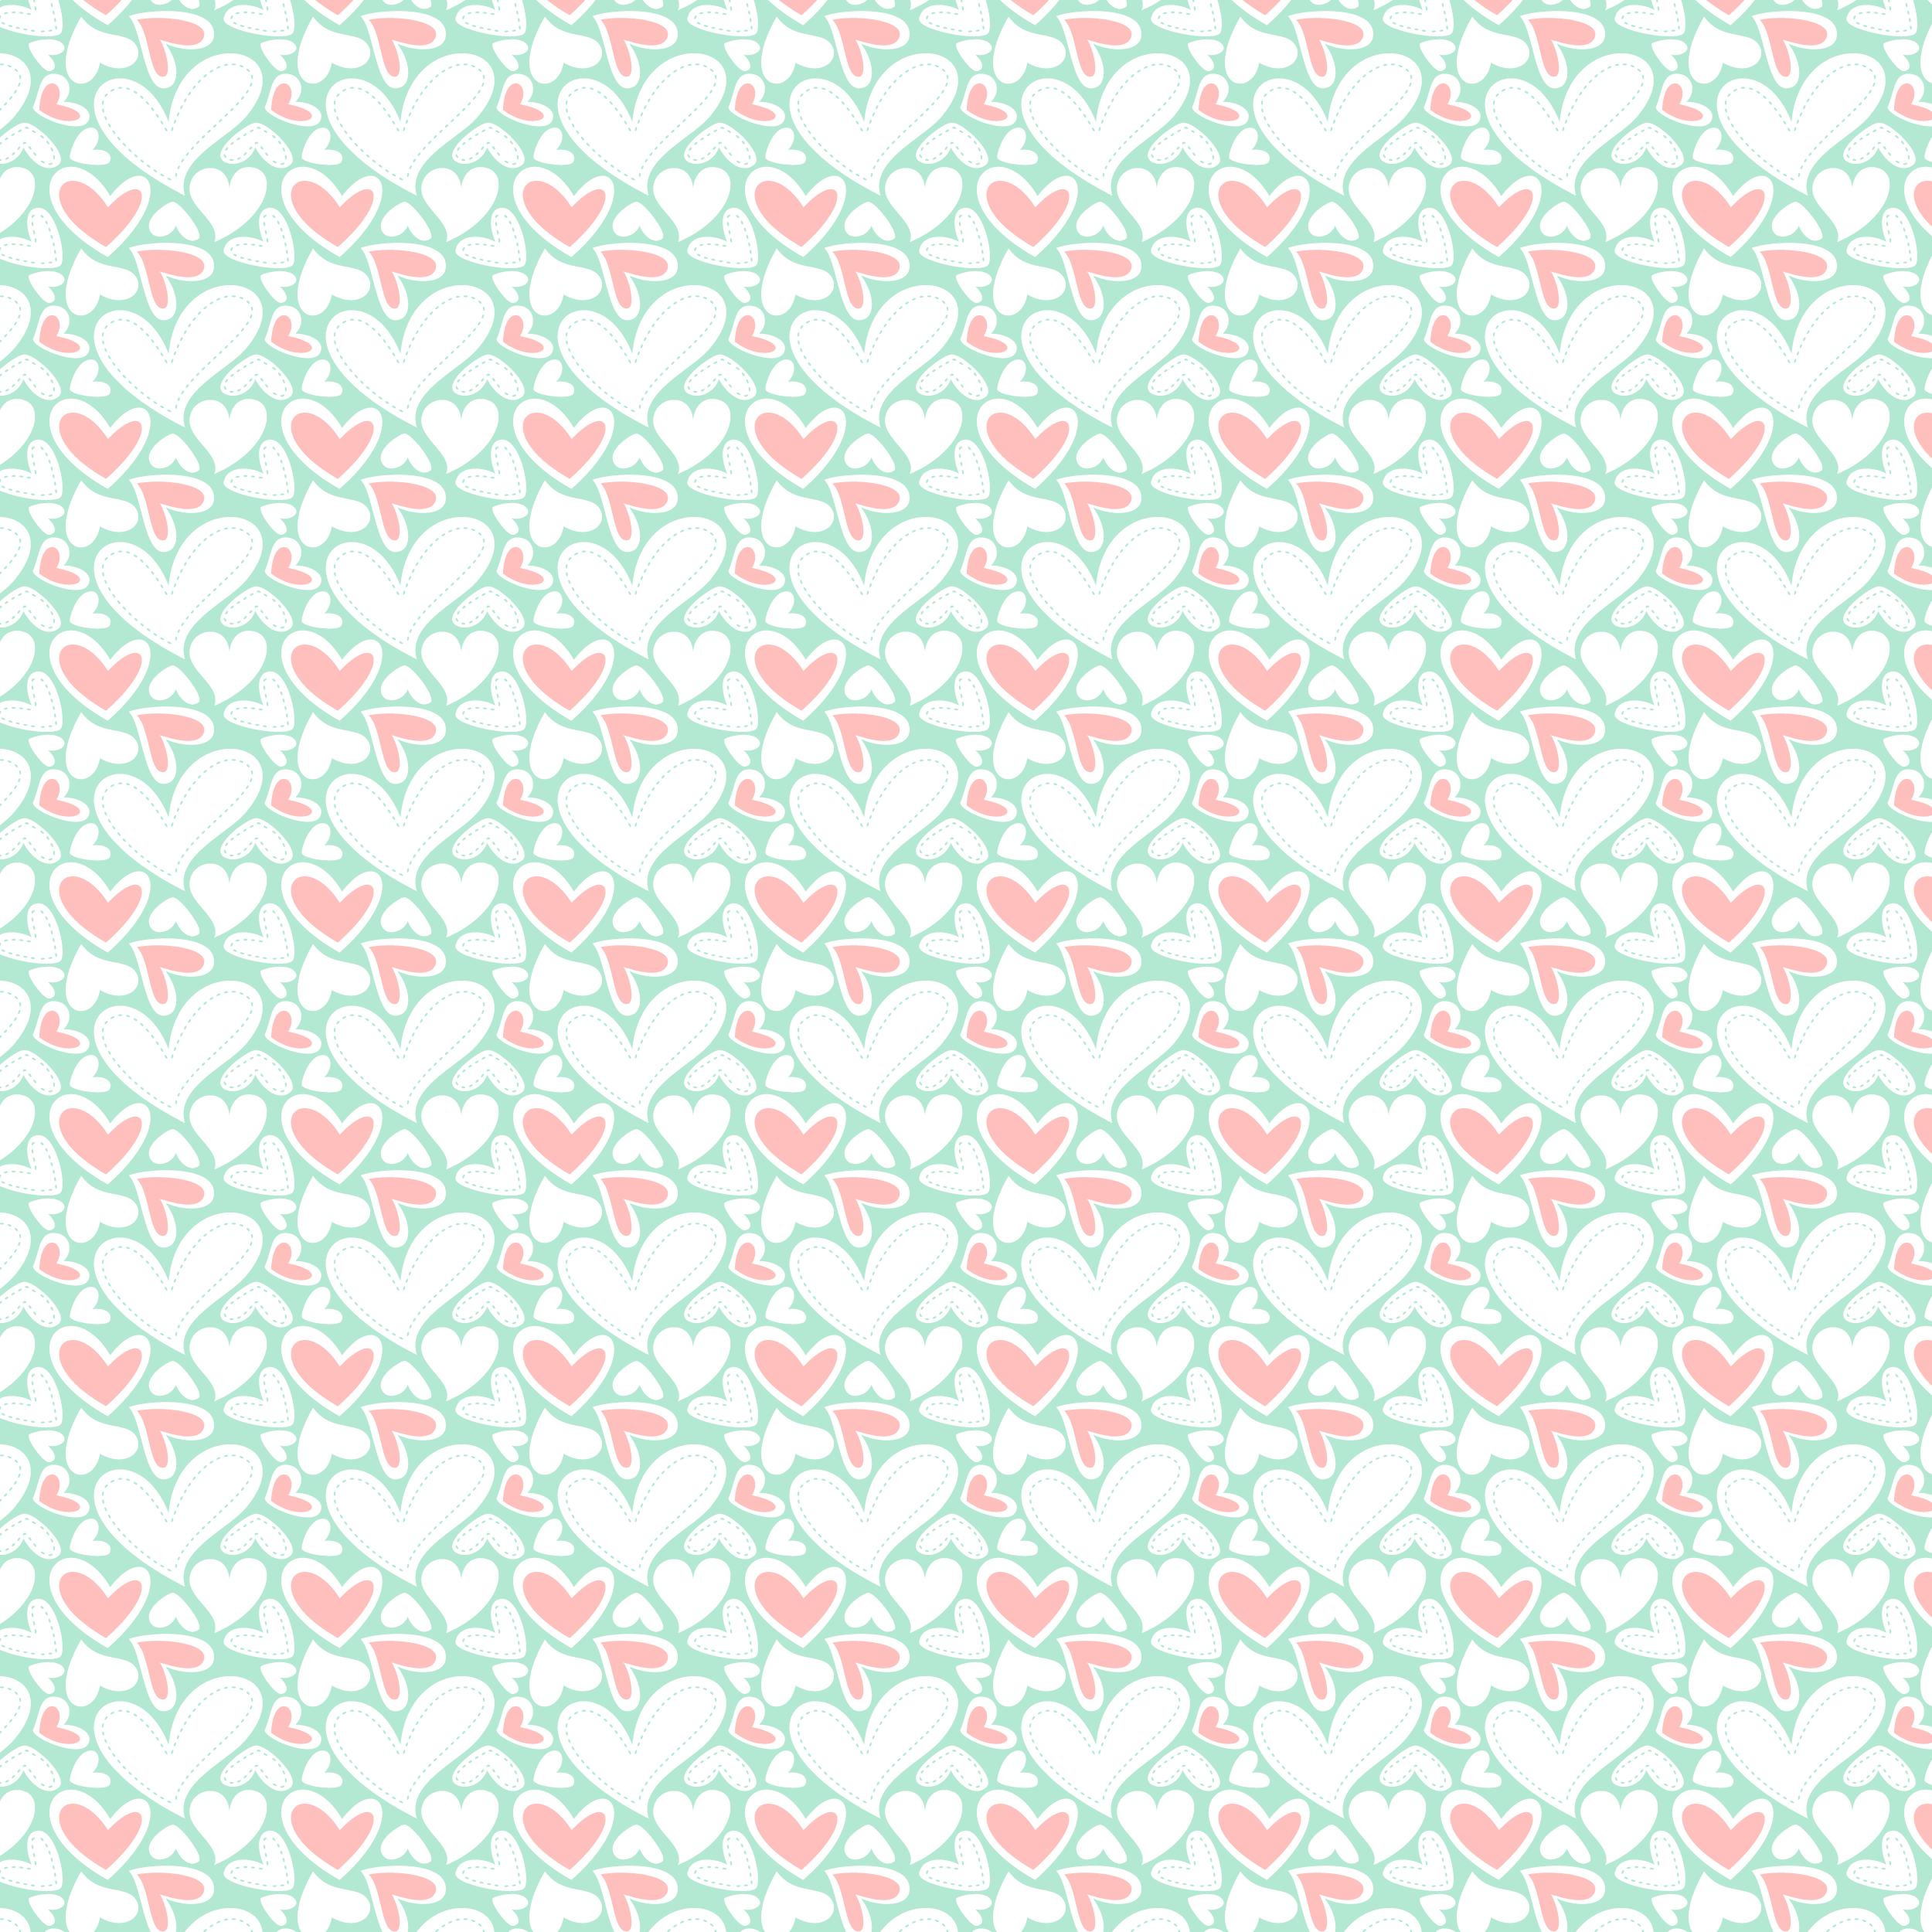 FabNFree-3111-StitchyHearts-TurquoisePink-Paper